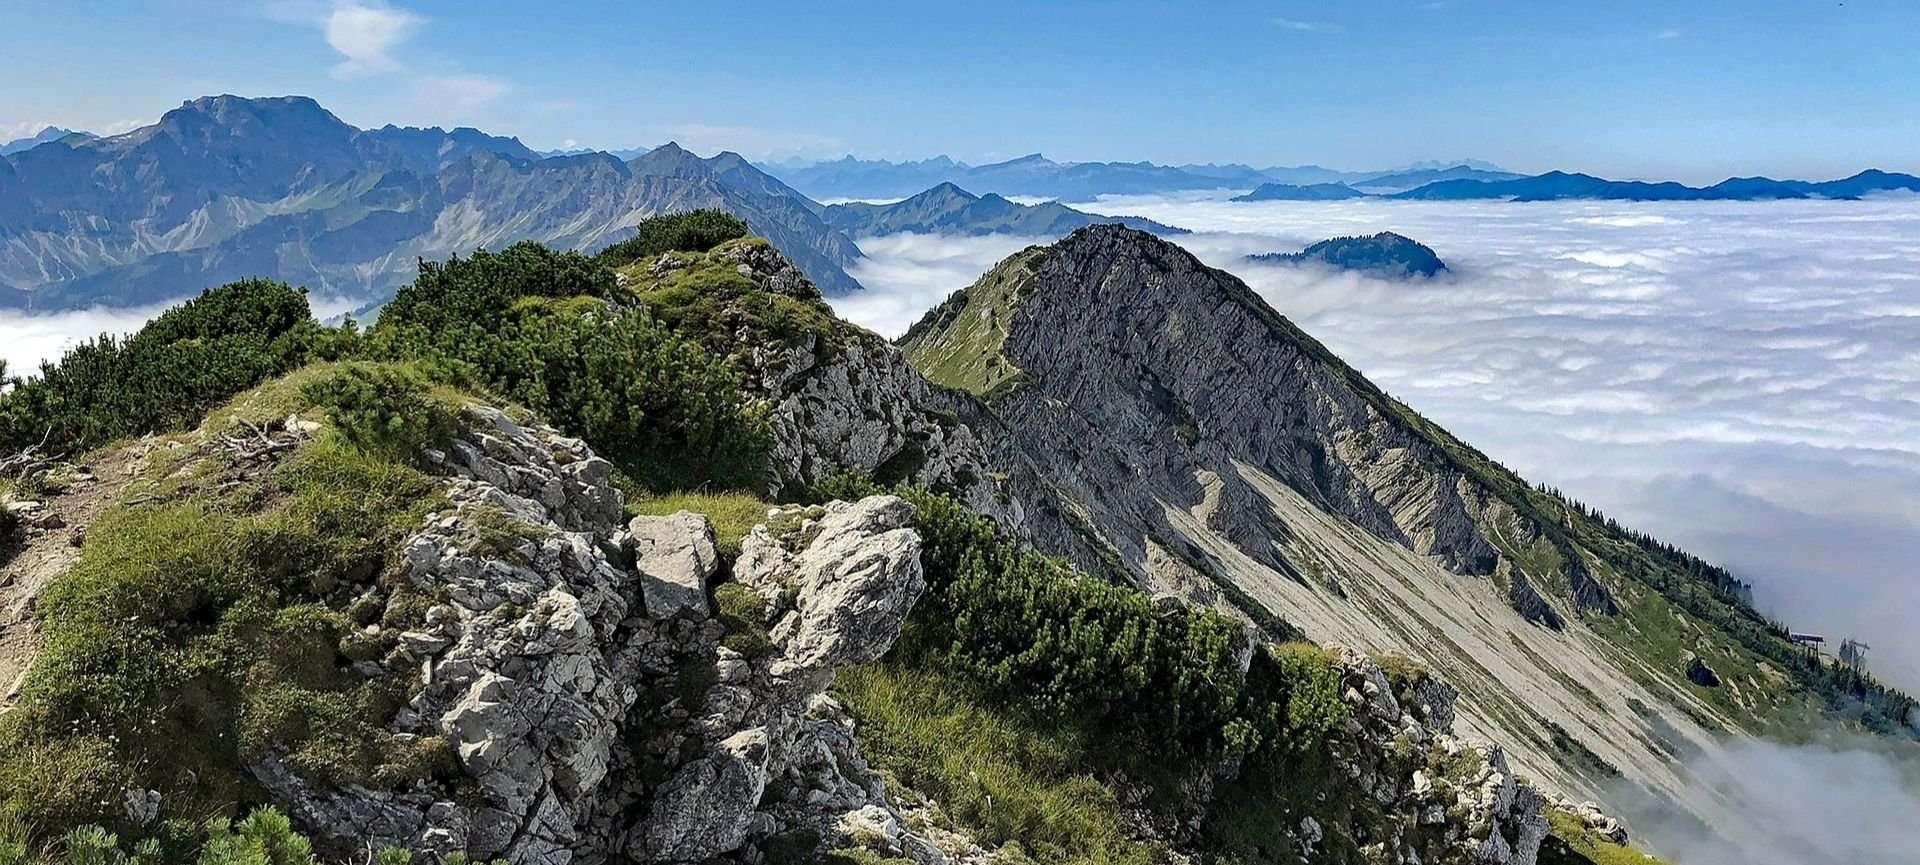 camminata in discesa in montagna